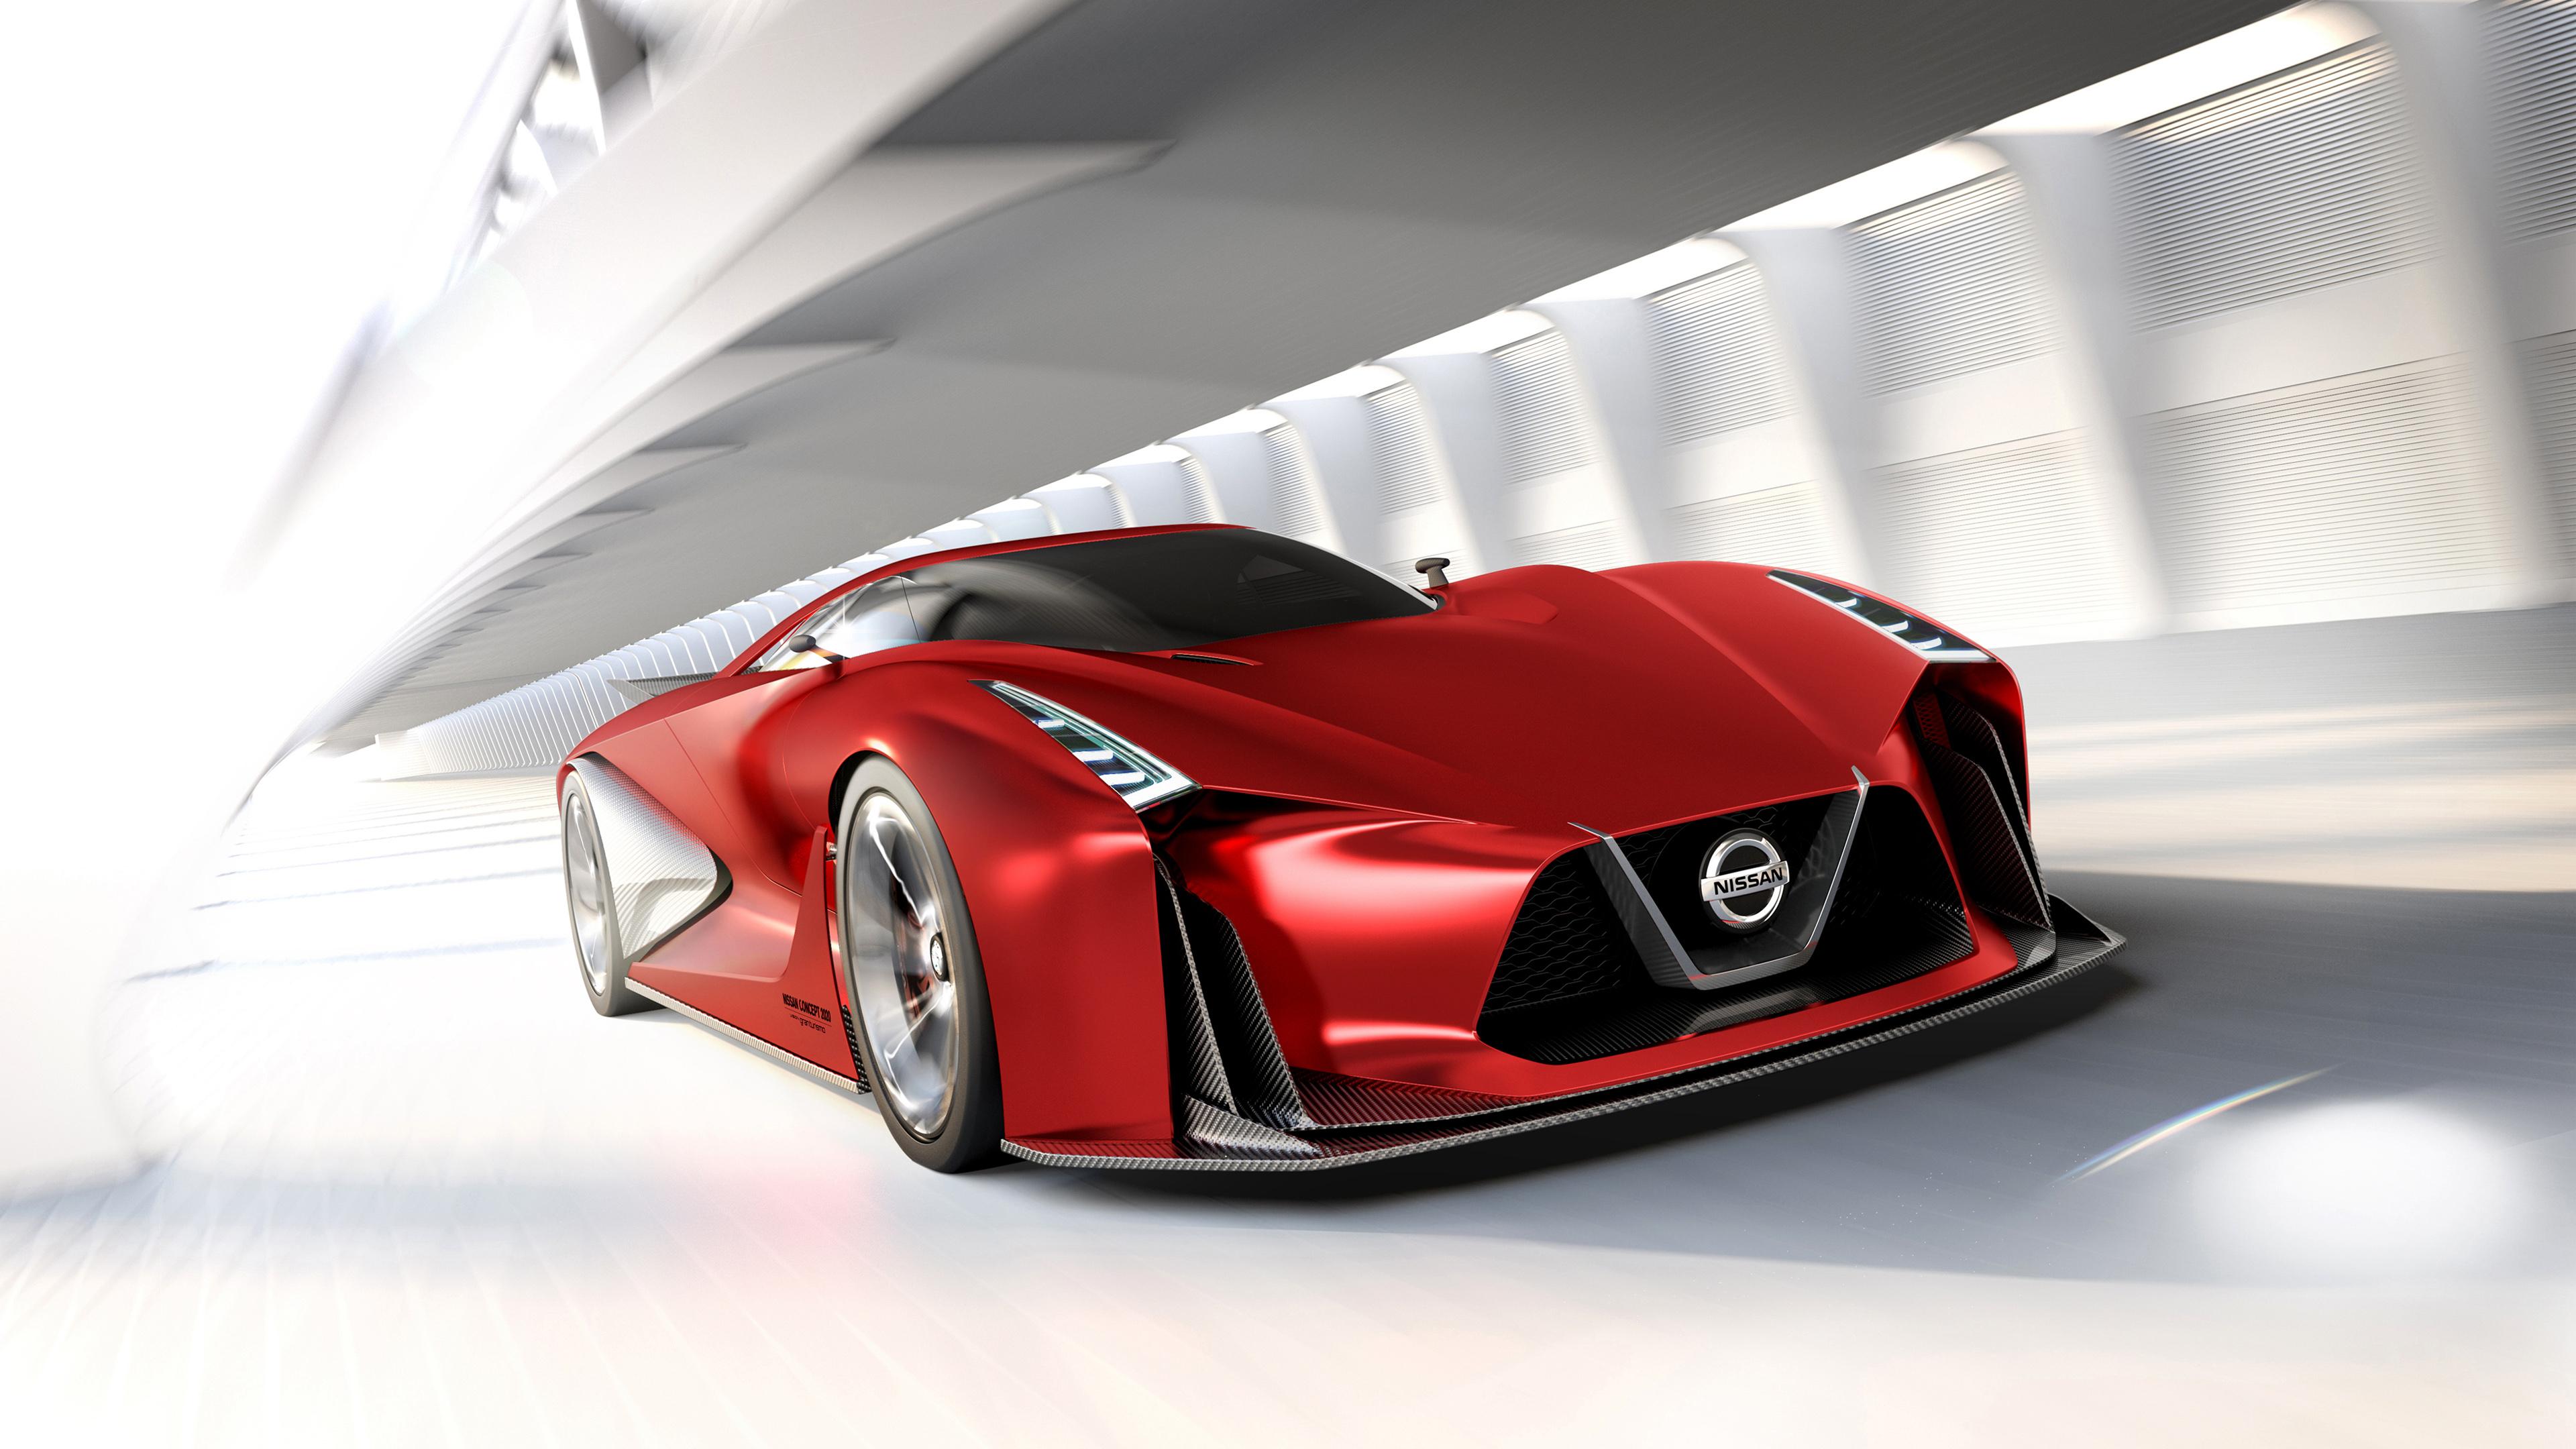 Nissan Concept 2020 Vision Gran Turismo 2 Wallpaper | HD ...